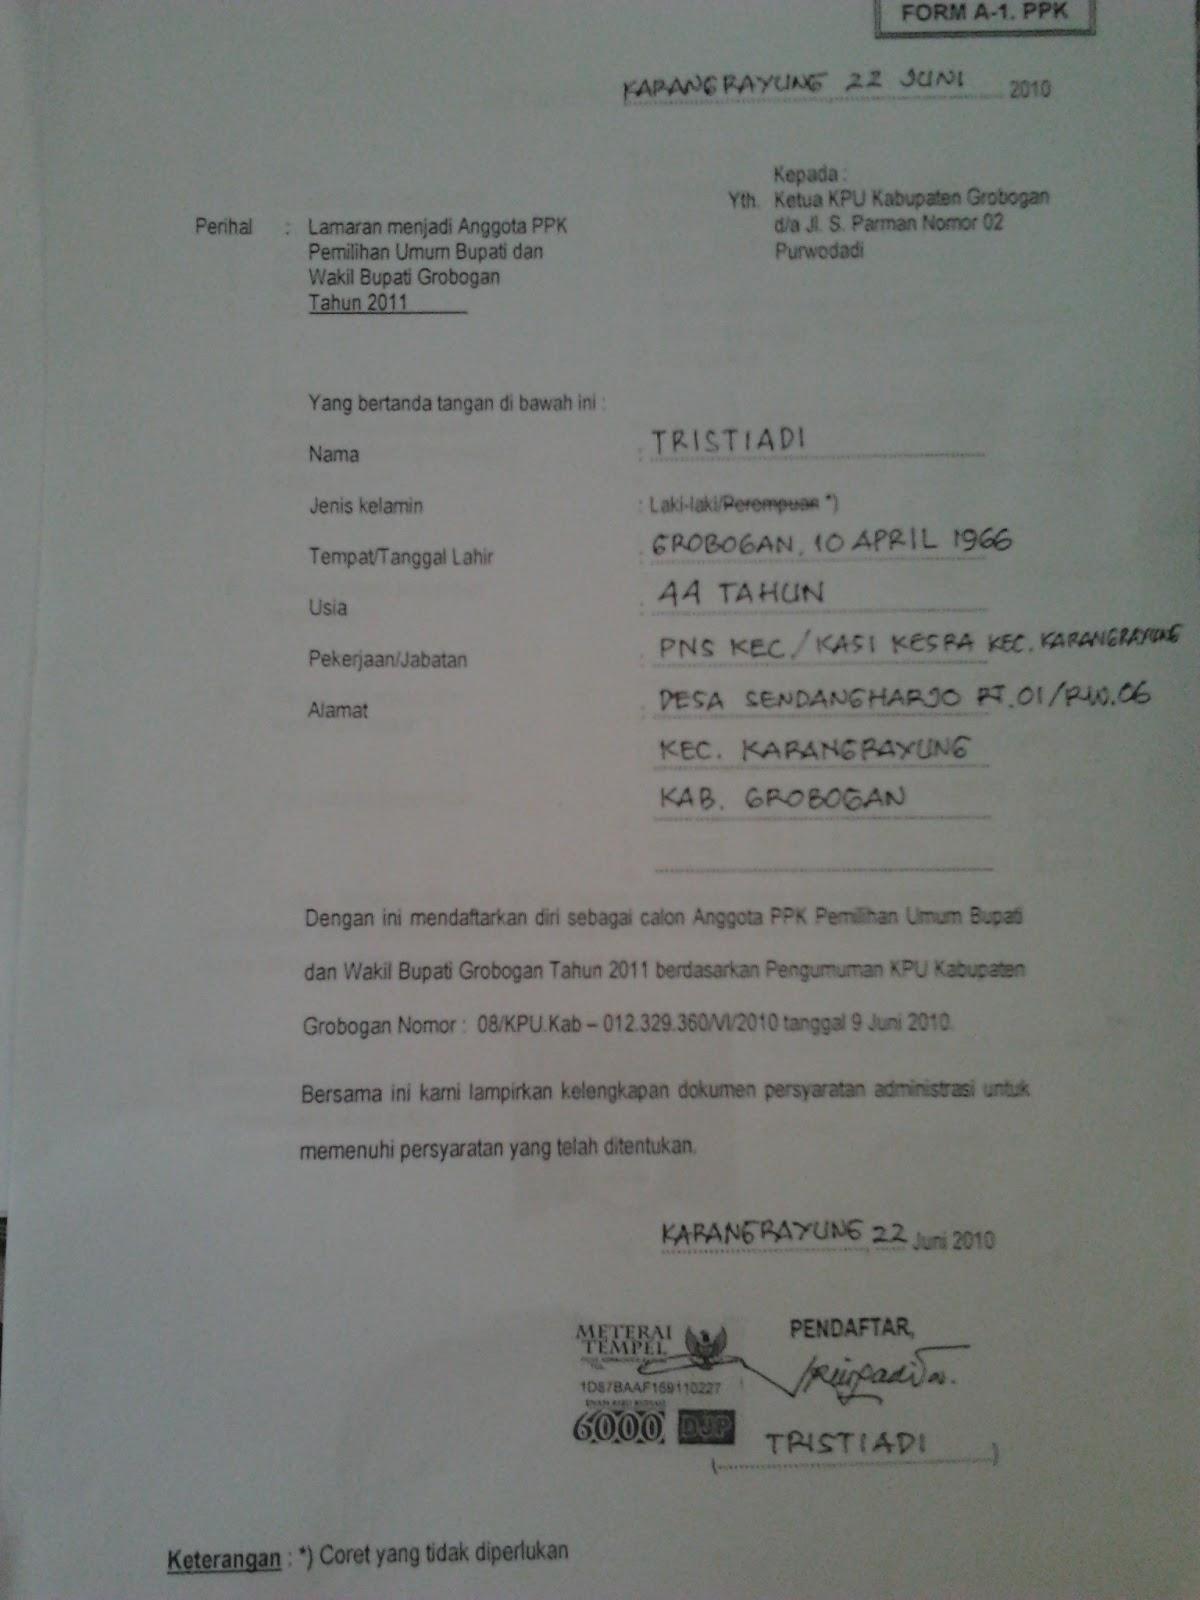 Contoh Surat Lamaran Menjadi Prajurit Tni 2015